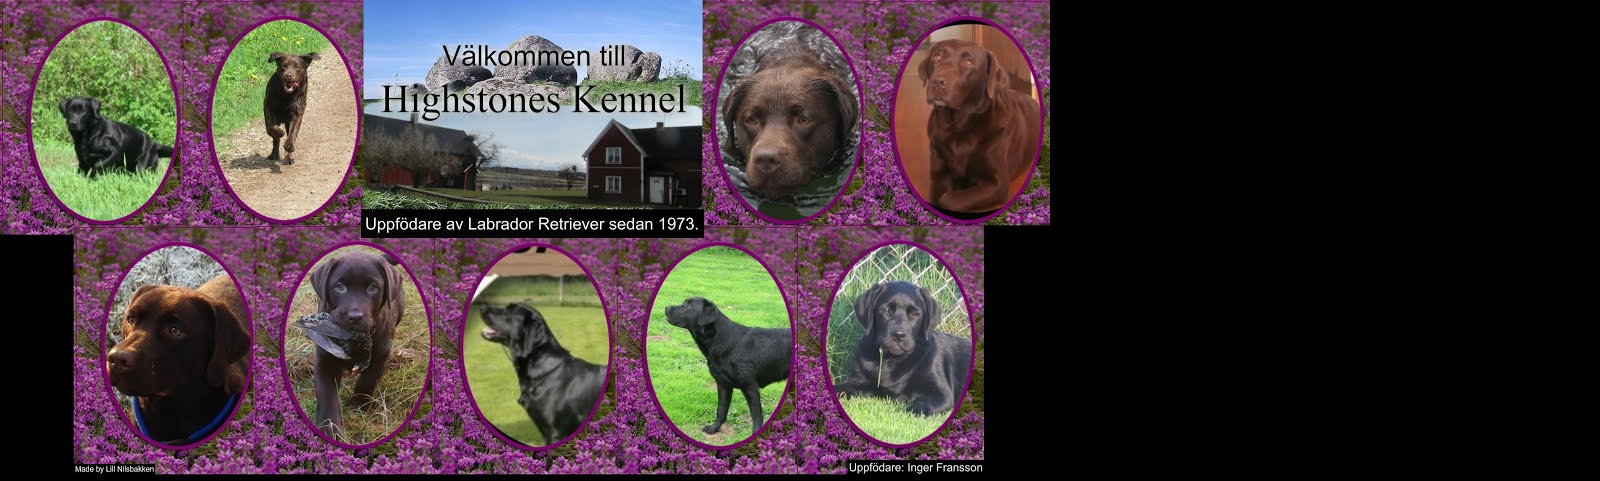 Highstones Kennel